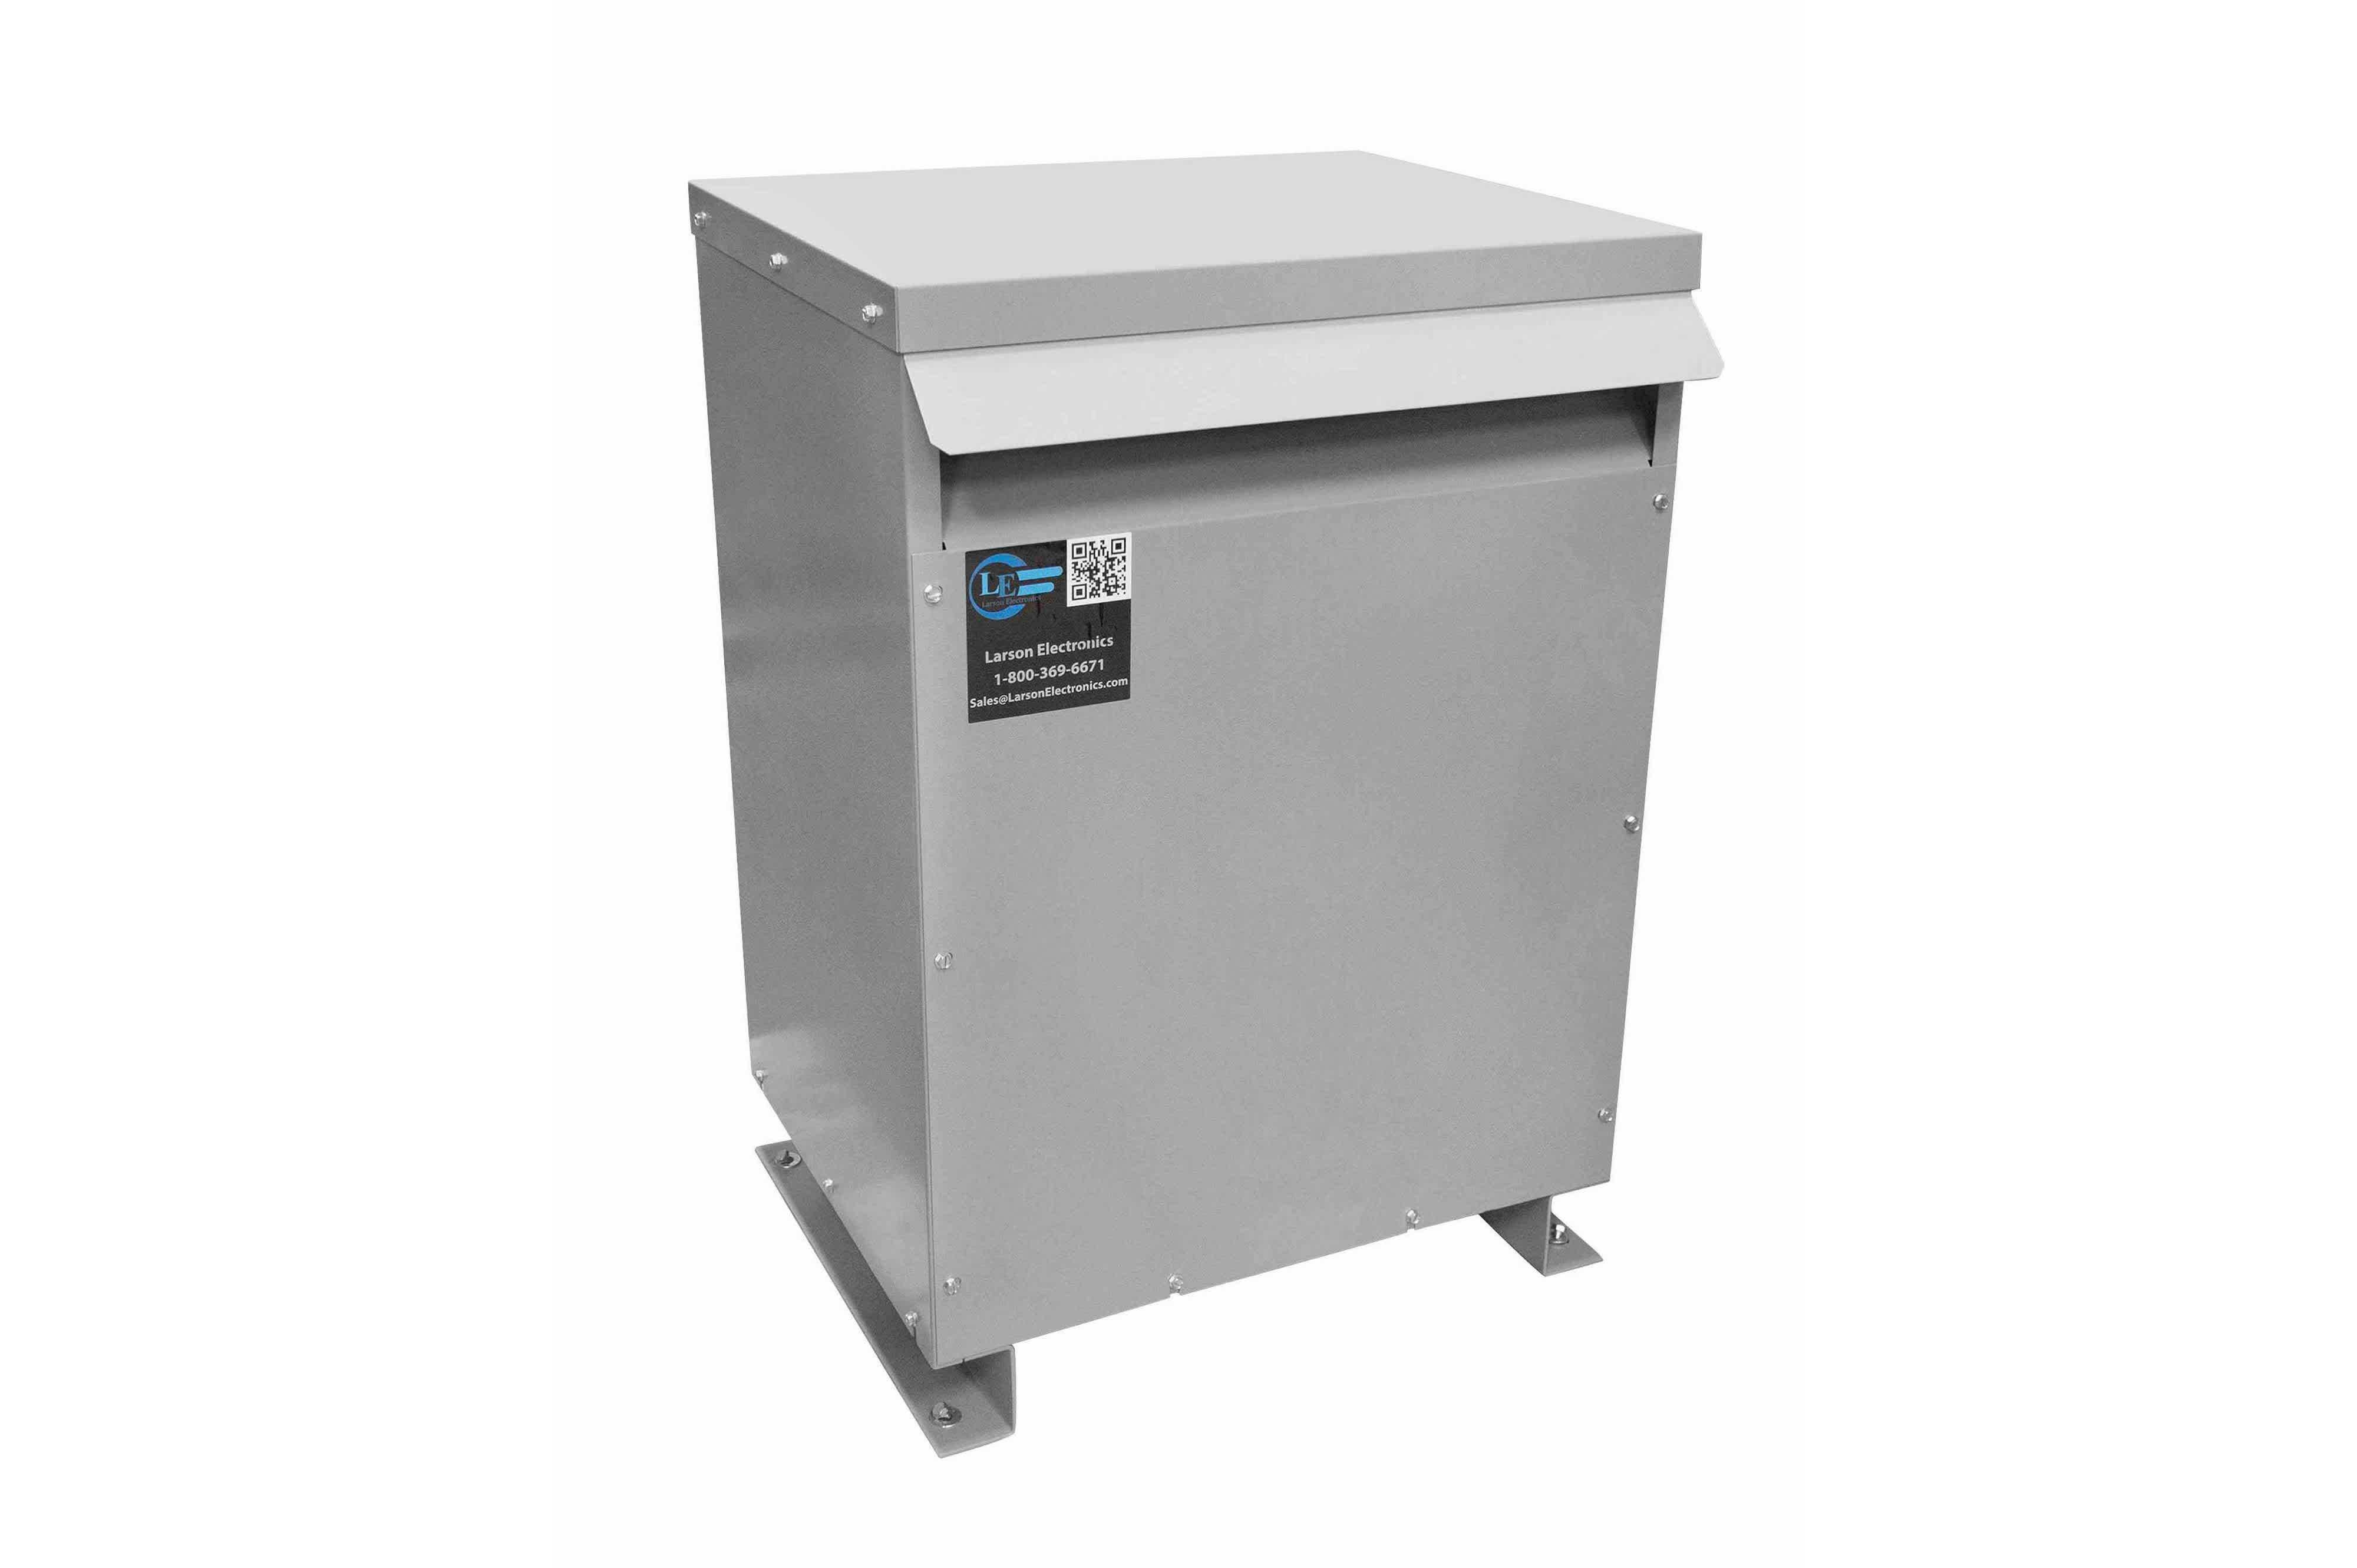 25 kVA 3PH Isolation Transformer, 220V Wye Primary, 480Y/277 Wye-N Secondary, N3R, Ventilated, 60 Hz